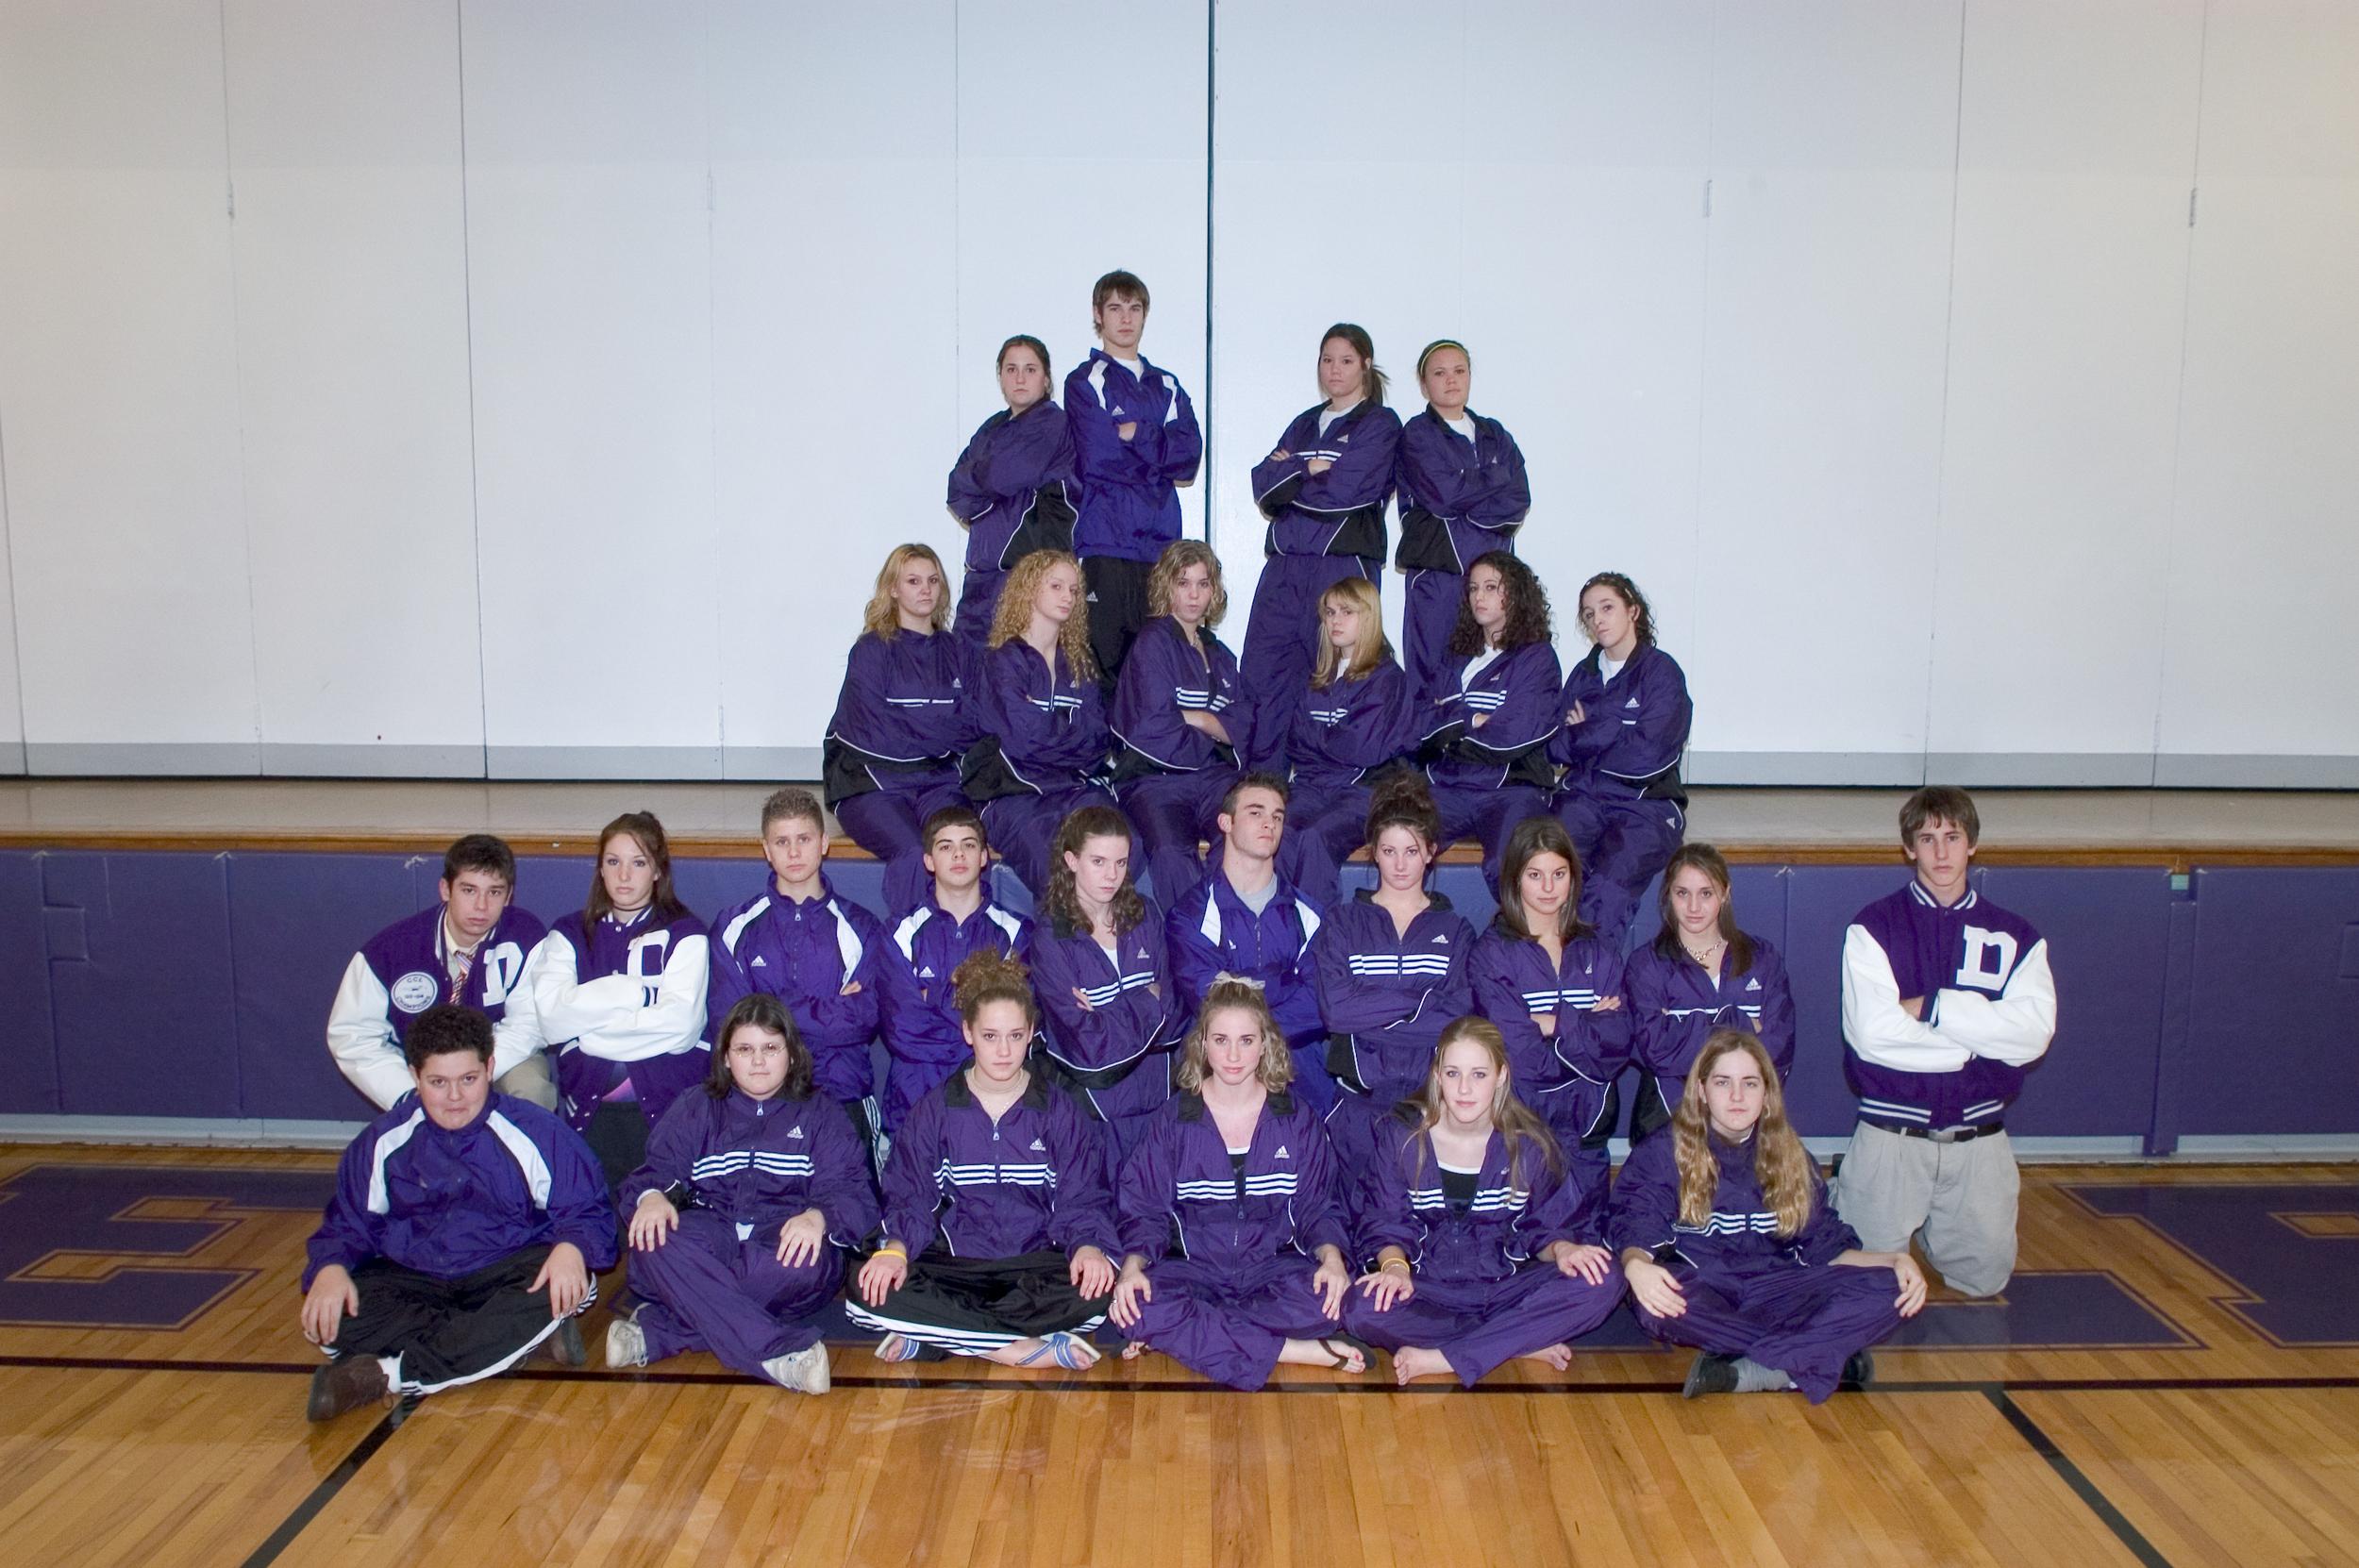 2005 CCL Champions